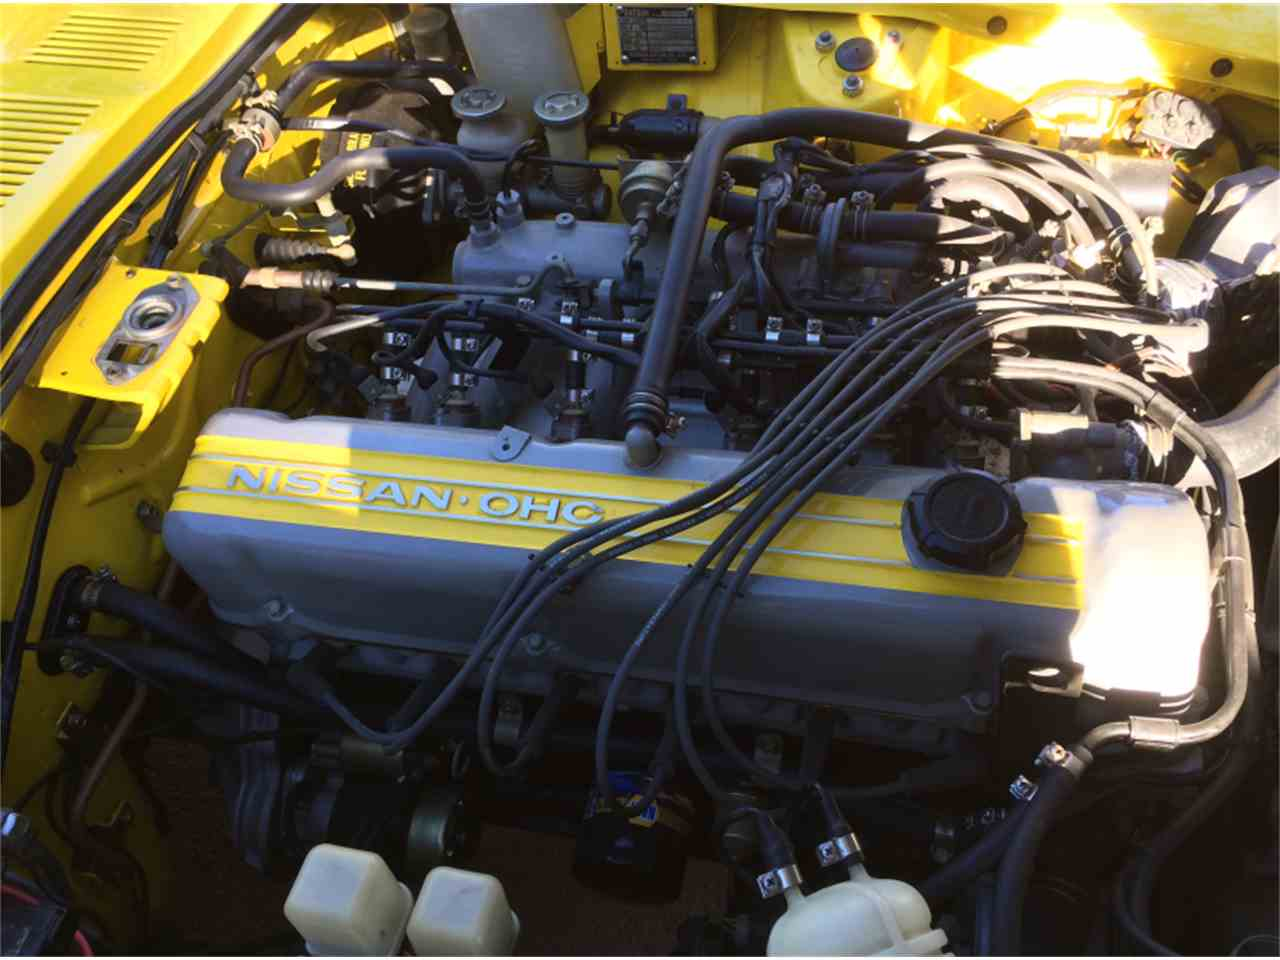 2017 06 1976 datsun 280z engine block for sale - 1976 Datsun 280z For Sale Cc 891709